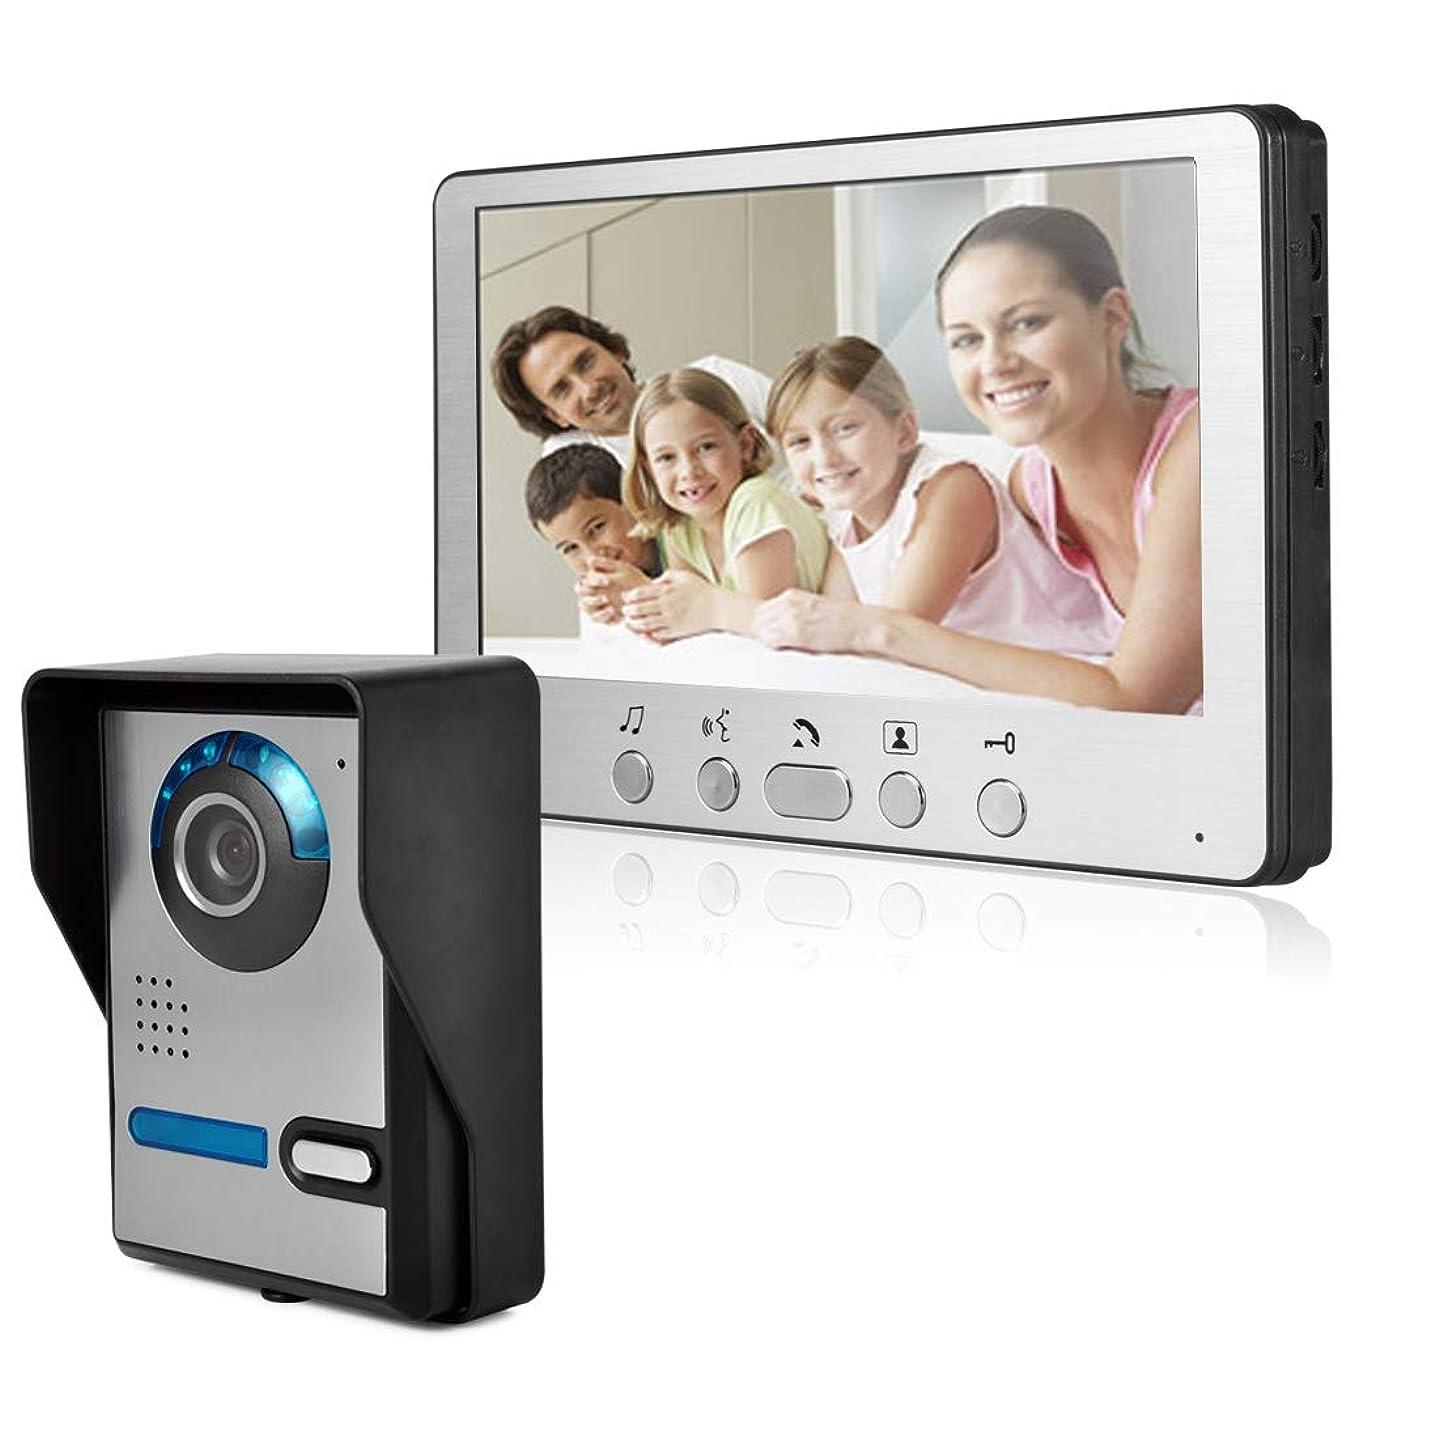 JINPENGPEN 7 inch Intelligent Video doorbell Telephone intercom System Video Door Night Vision Function Home Monitoring amrhjixhpv792223